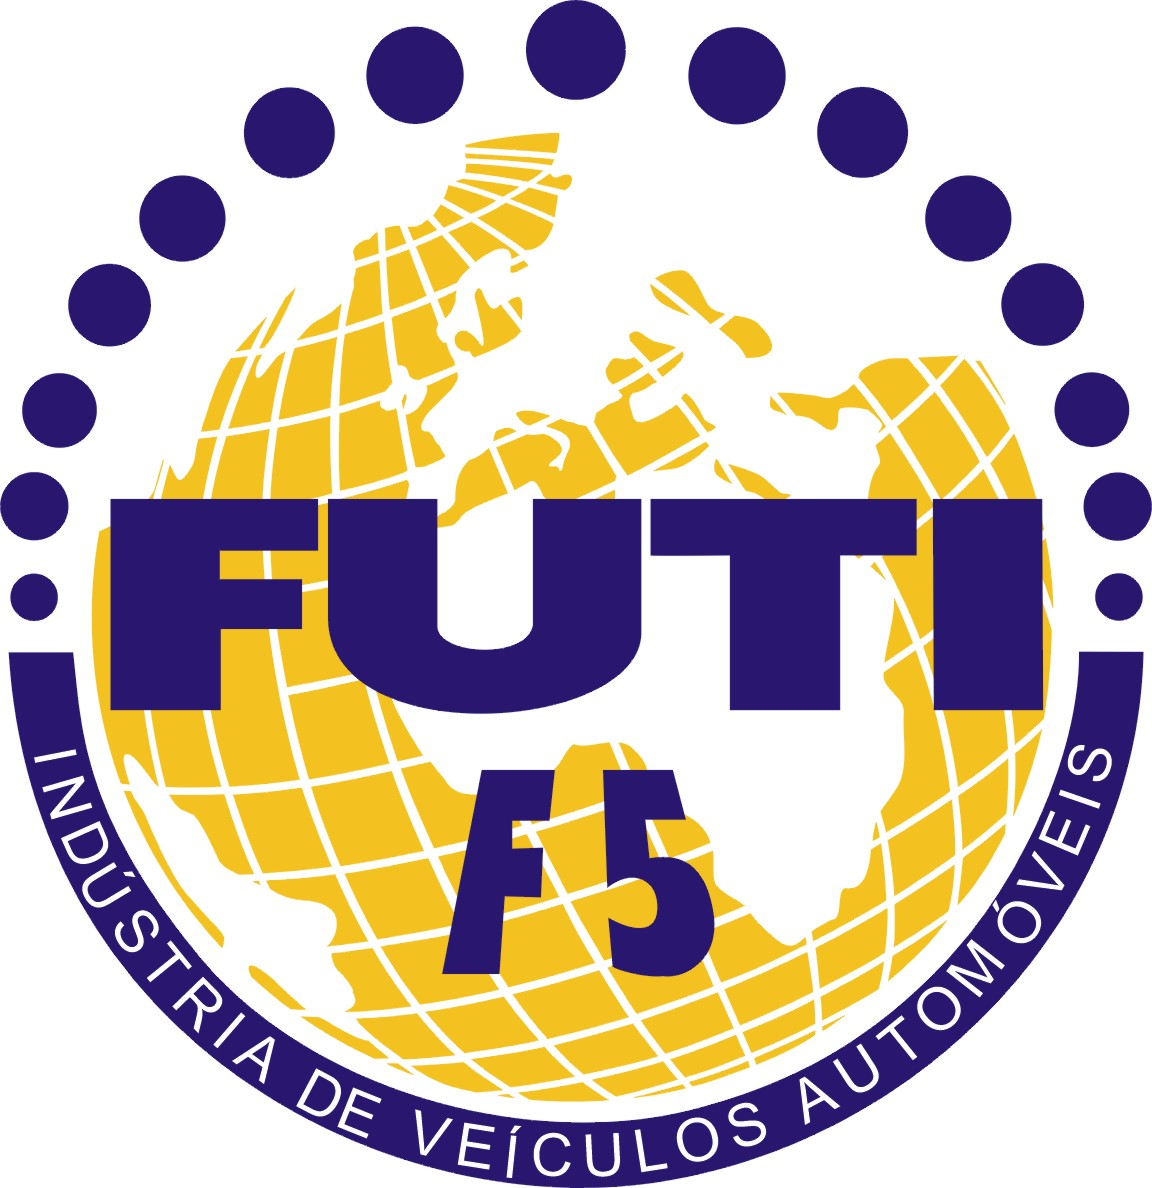 Futi - Industria de Veículos Automóveis, L.da